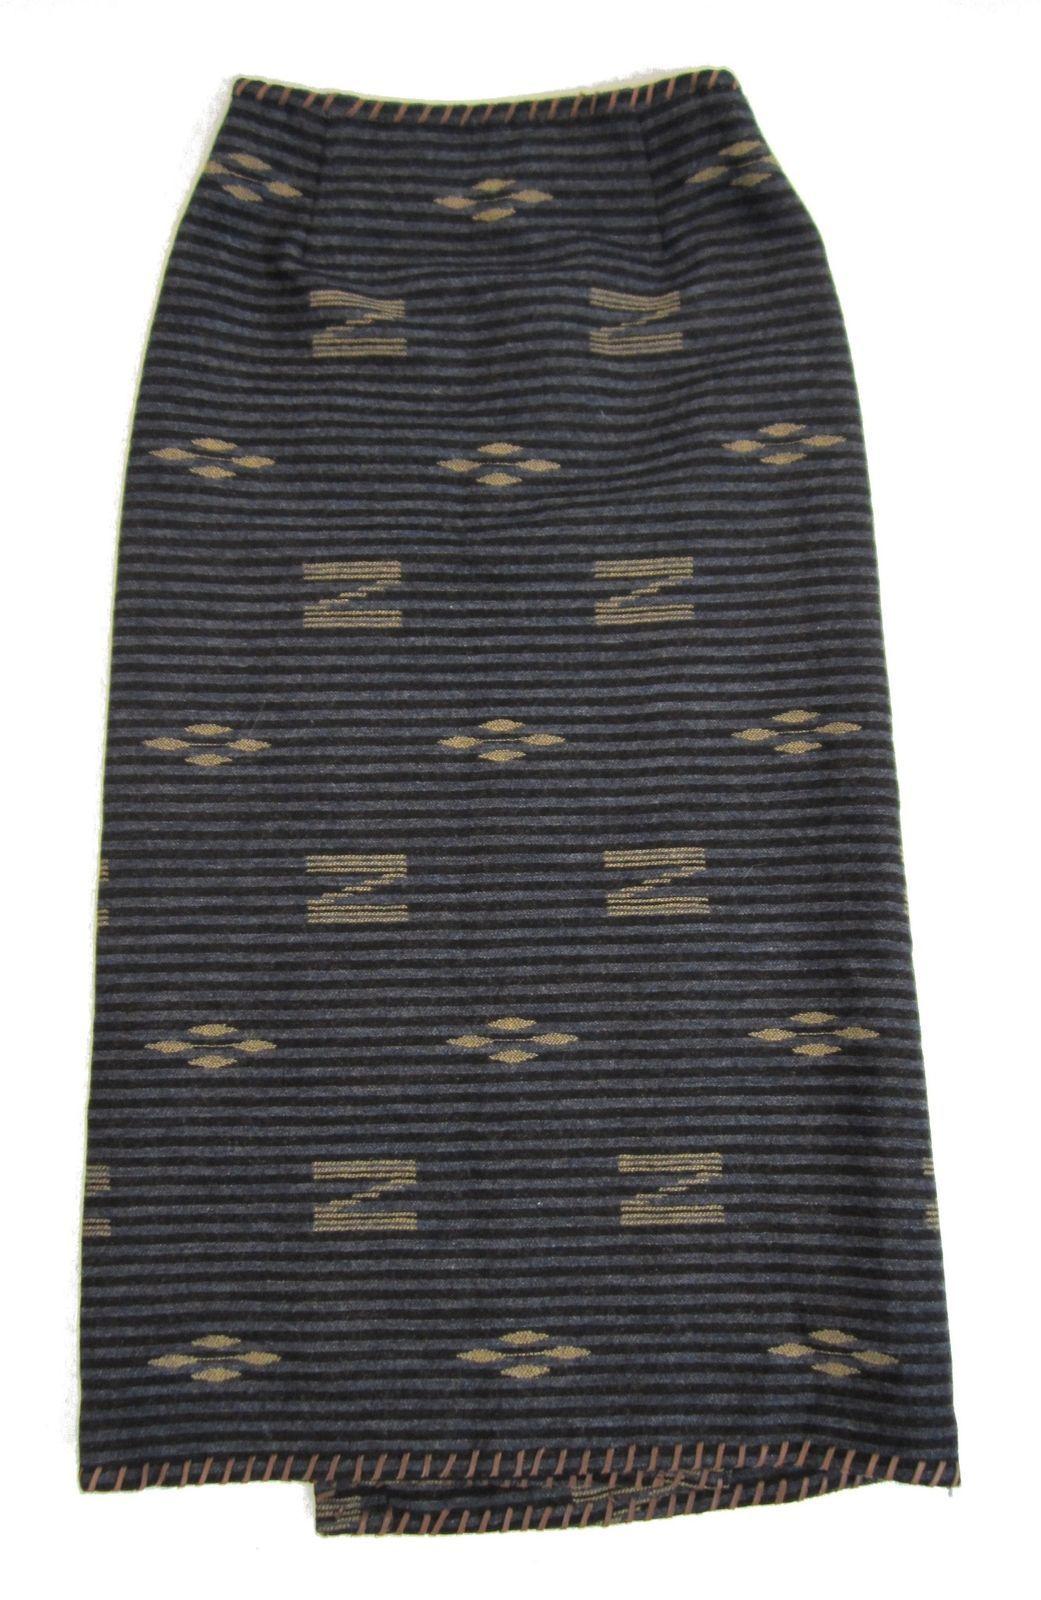 8 LAUREN Blue Wool Indian Blanket Concho Whipstitch Skirt